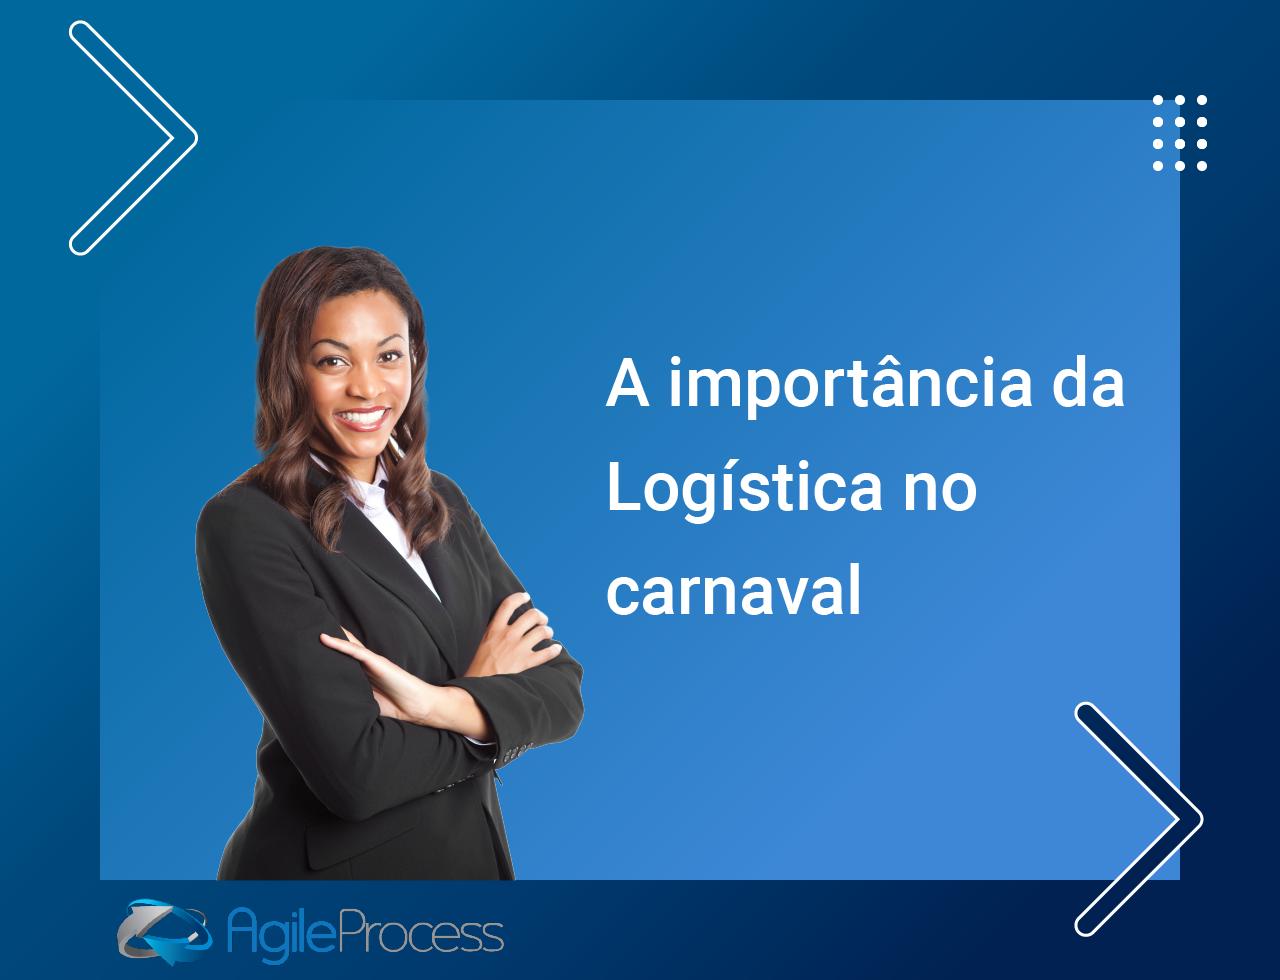 logística no carnaval